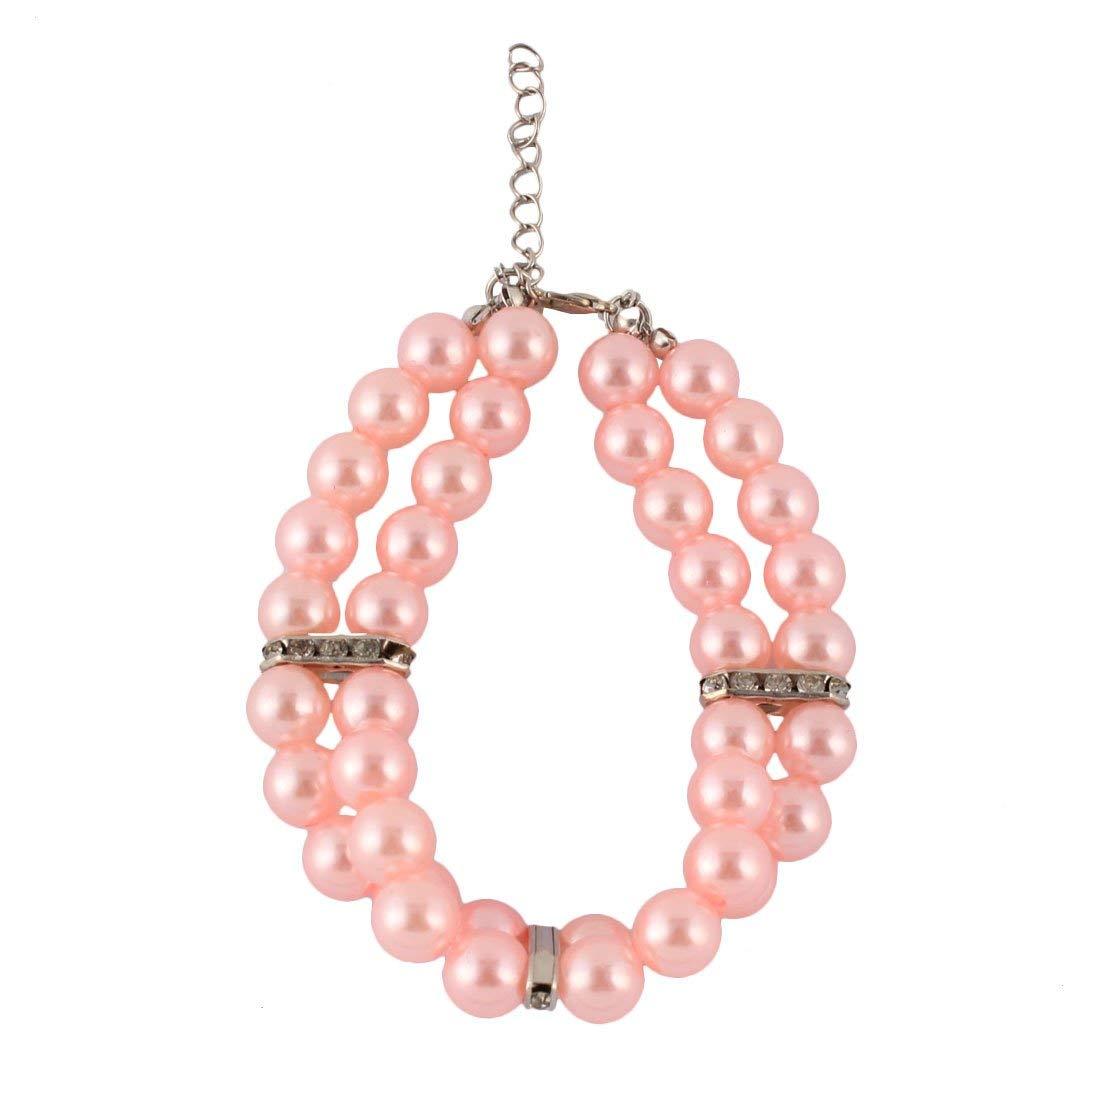 Dog Plastic Three Rows Round Beads Collar Necklace Light Pink